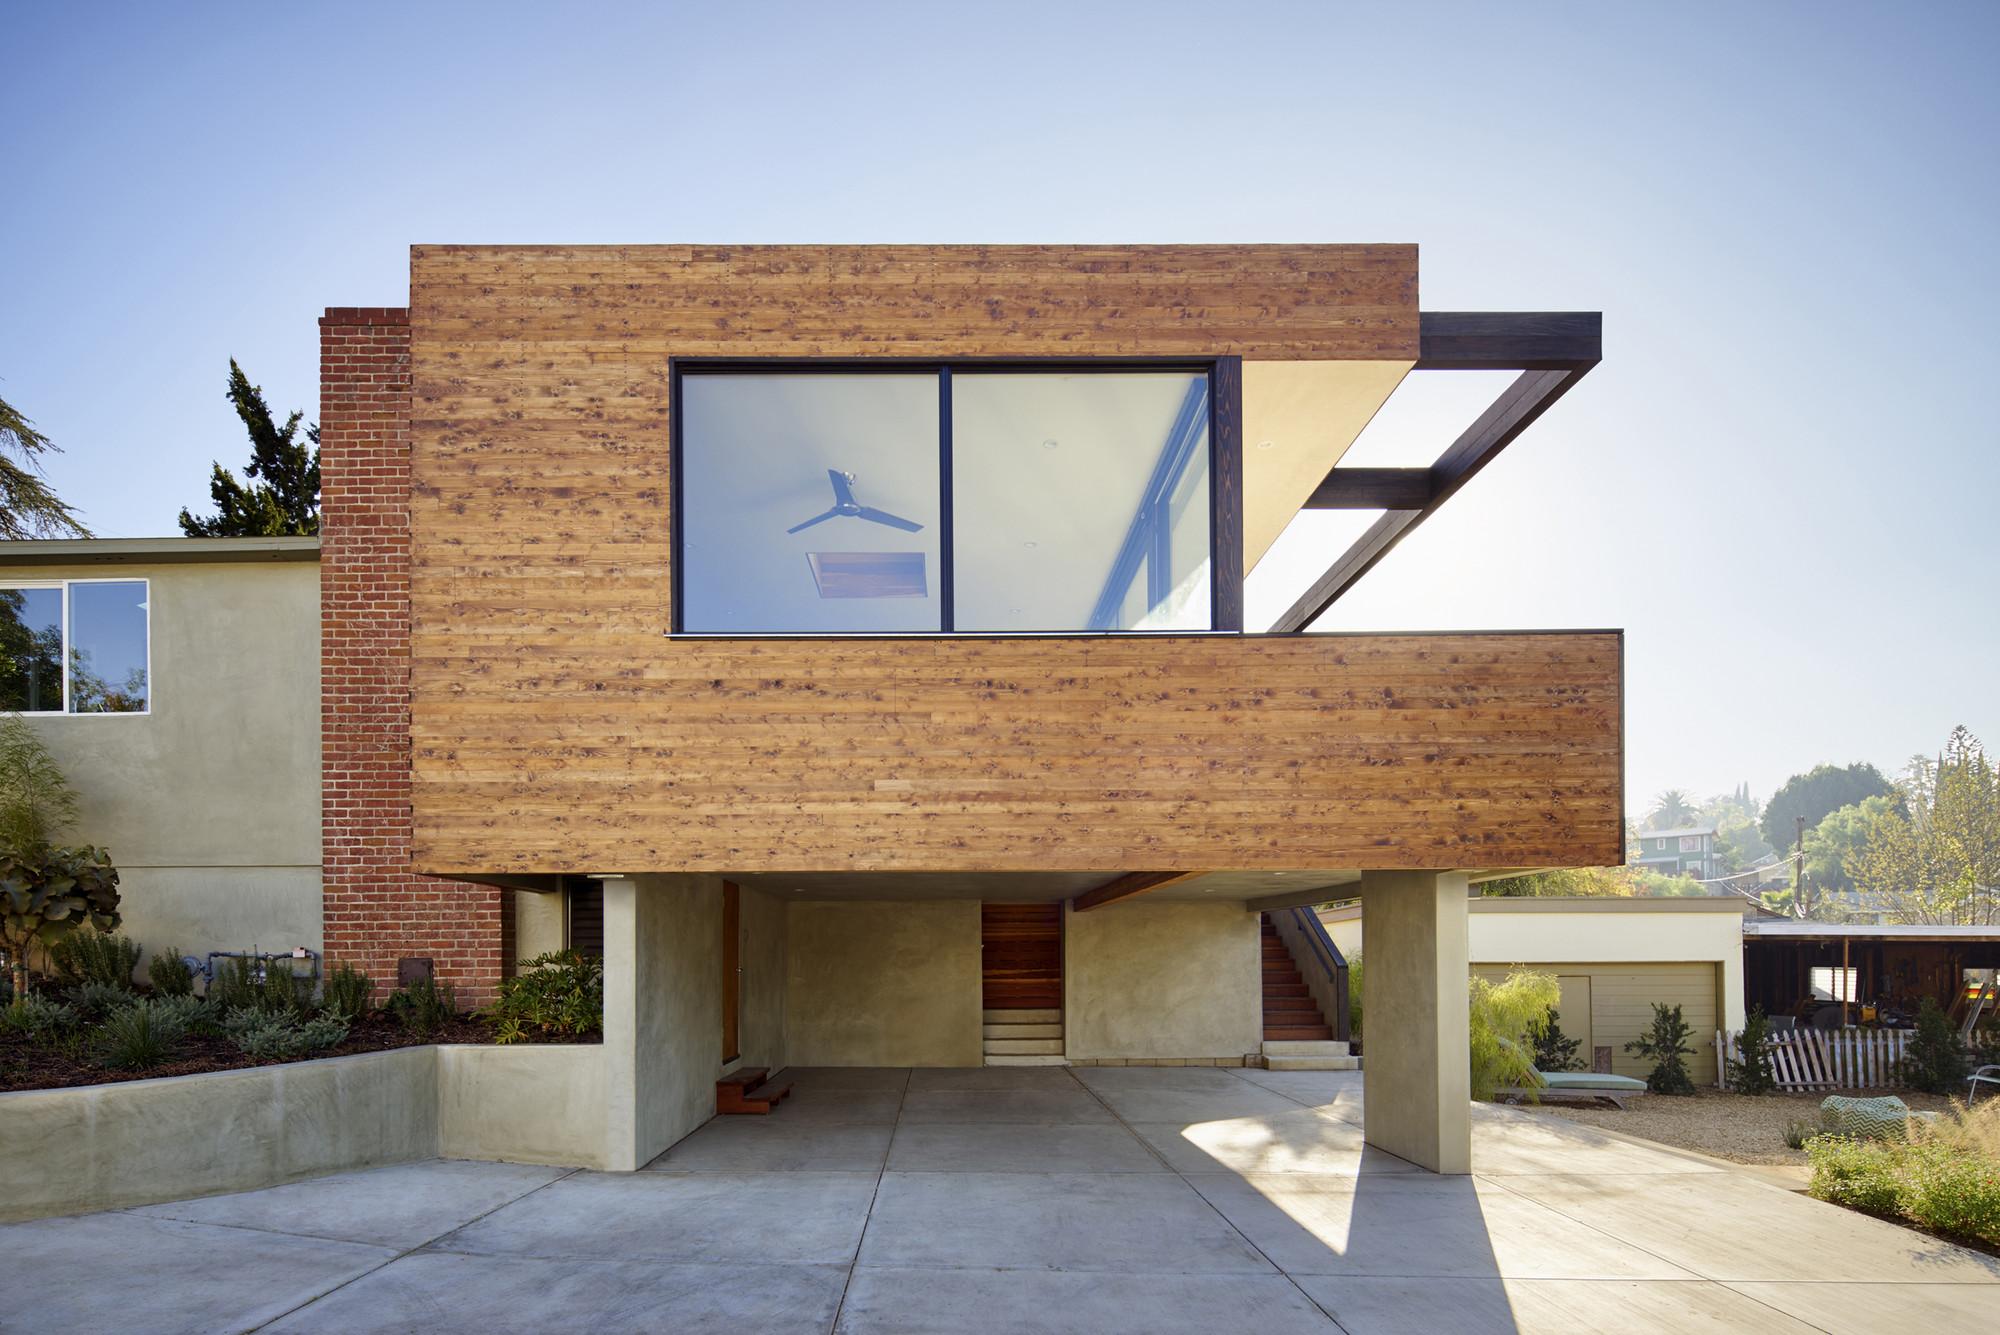 Morris House / Martin Fenlon Architecture, © Eric Staudenmaier